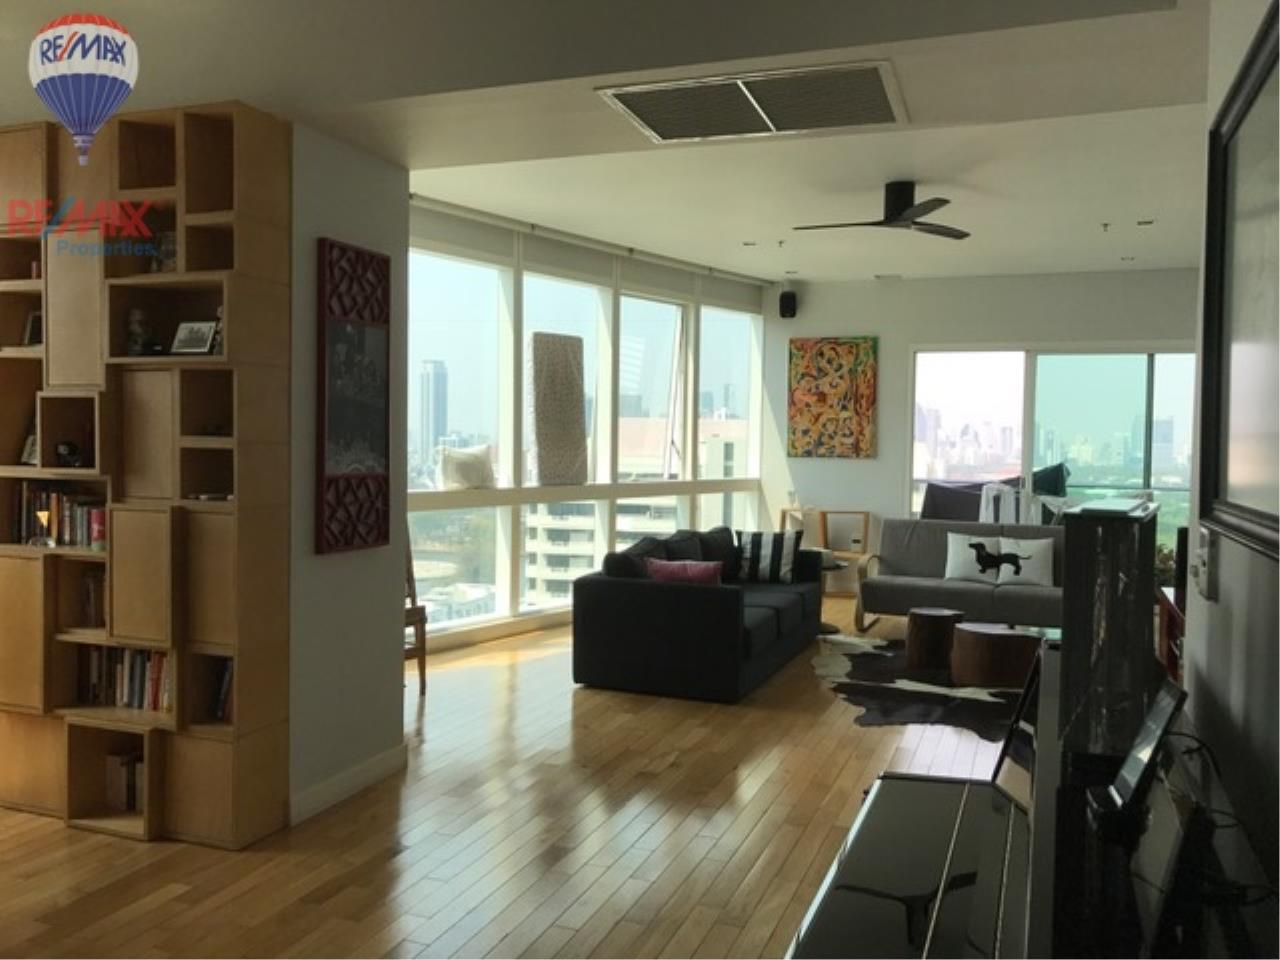 1 Bedroom At Millennuim Residence Sukhumvit Sale Millennium Residence 3 1 Bedroom 193 Sqm For Sale Prakard